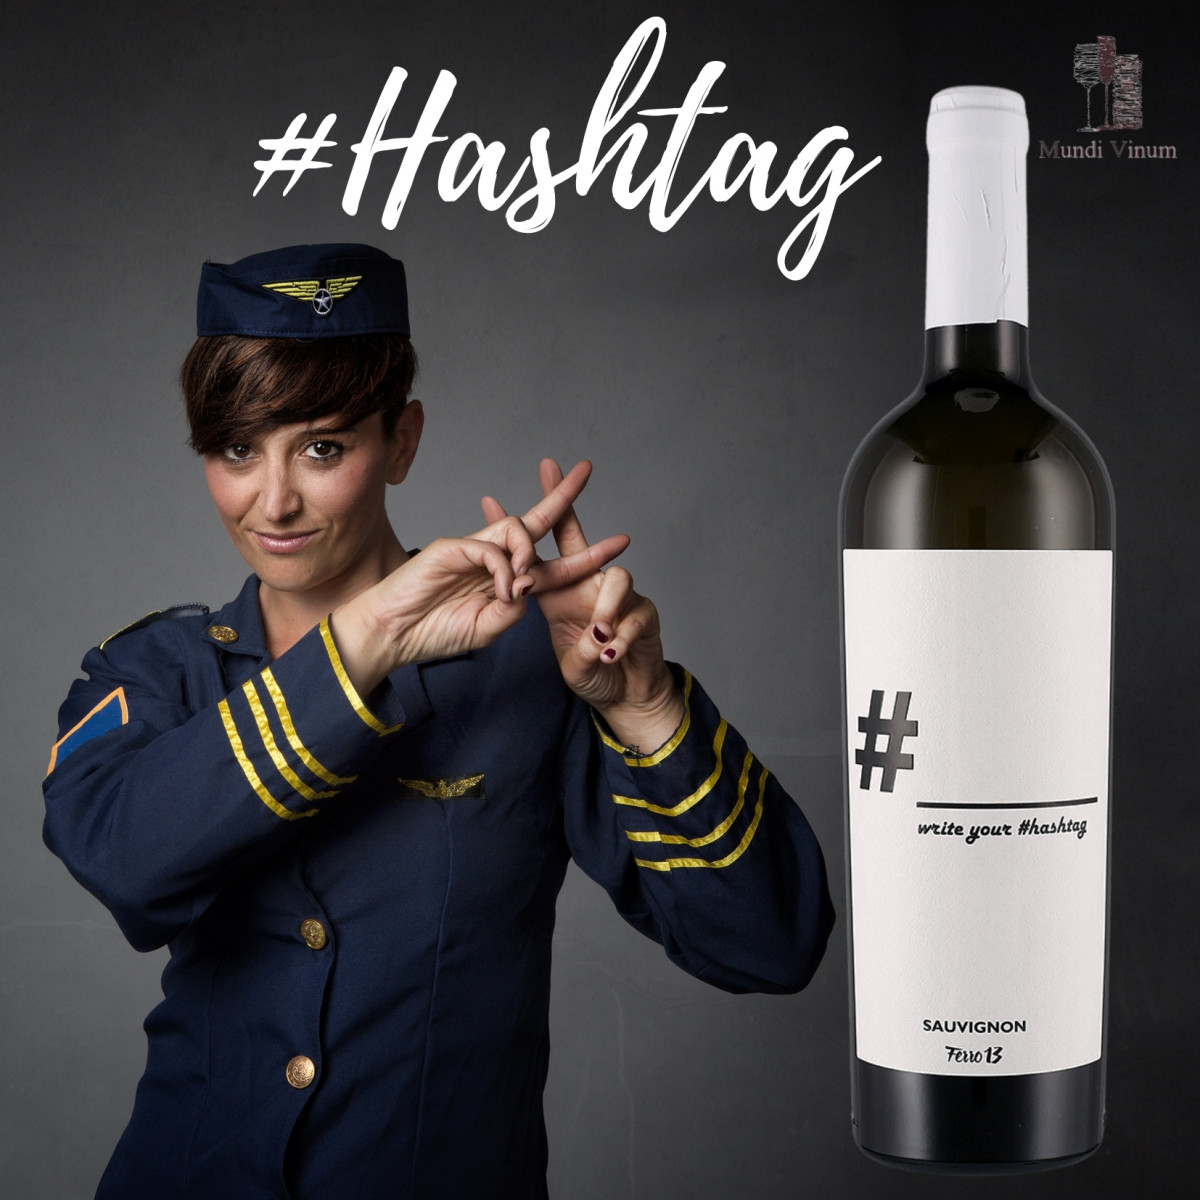 Ferro 13 # Hastag wijn